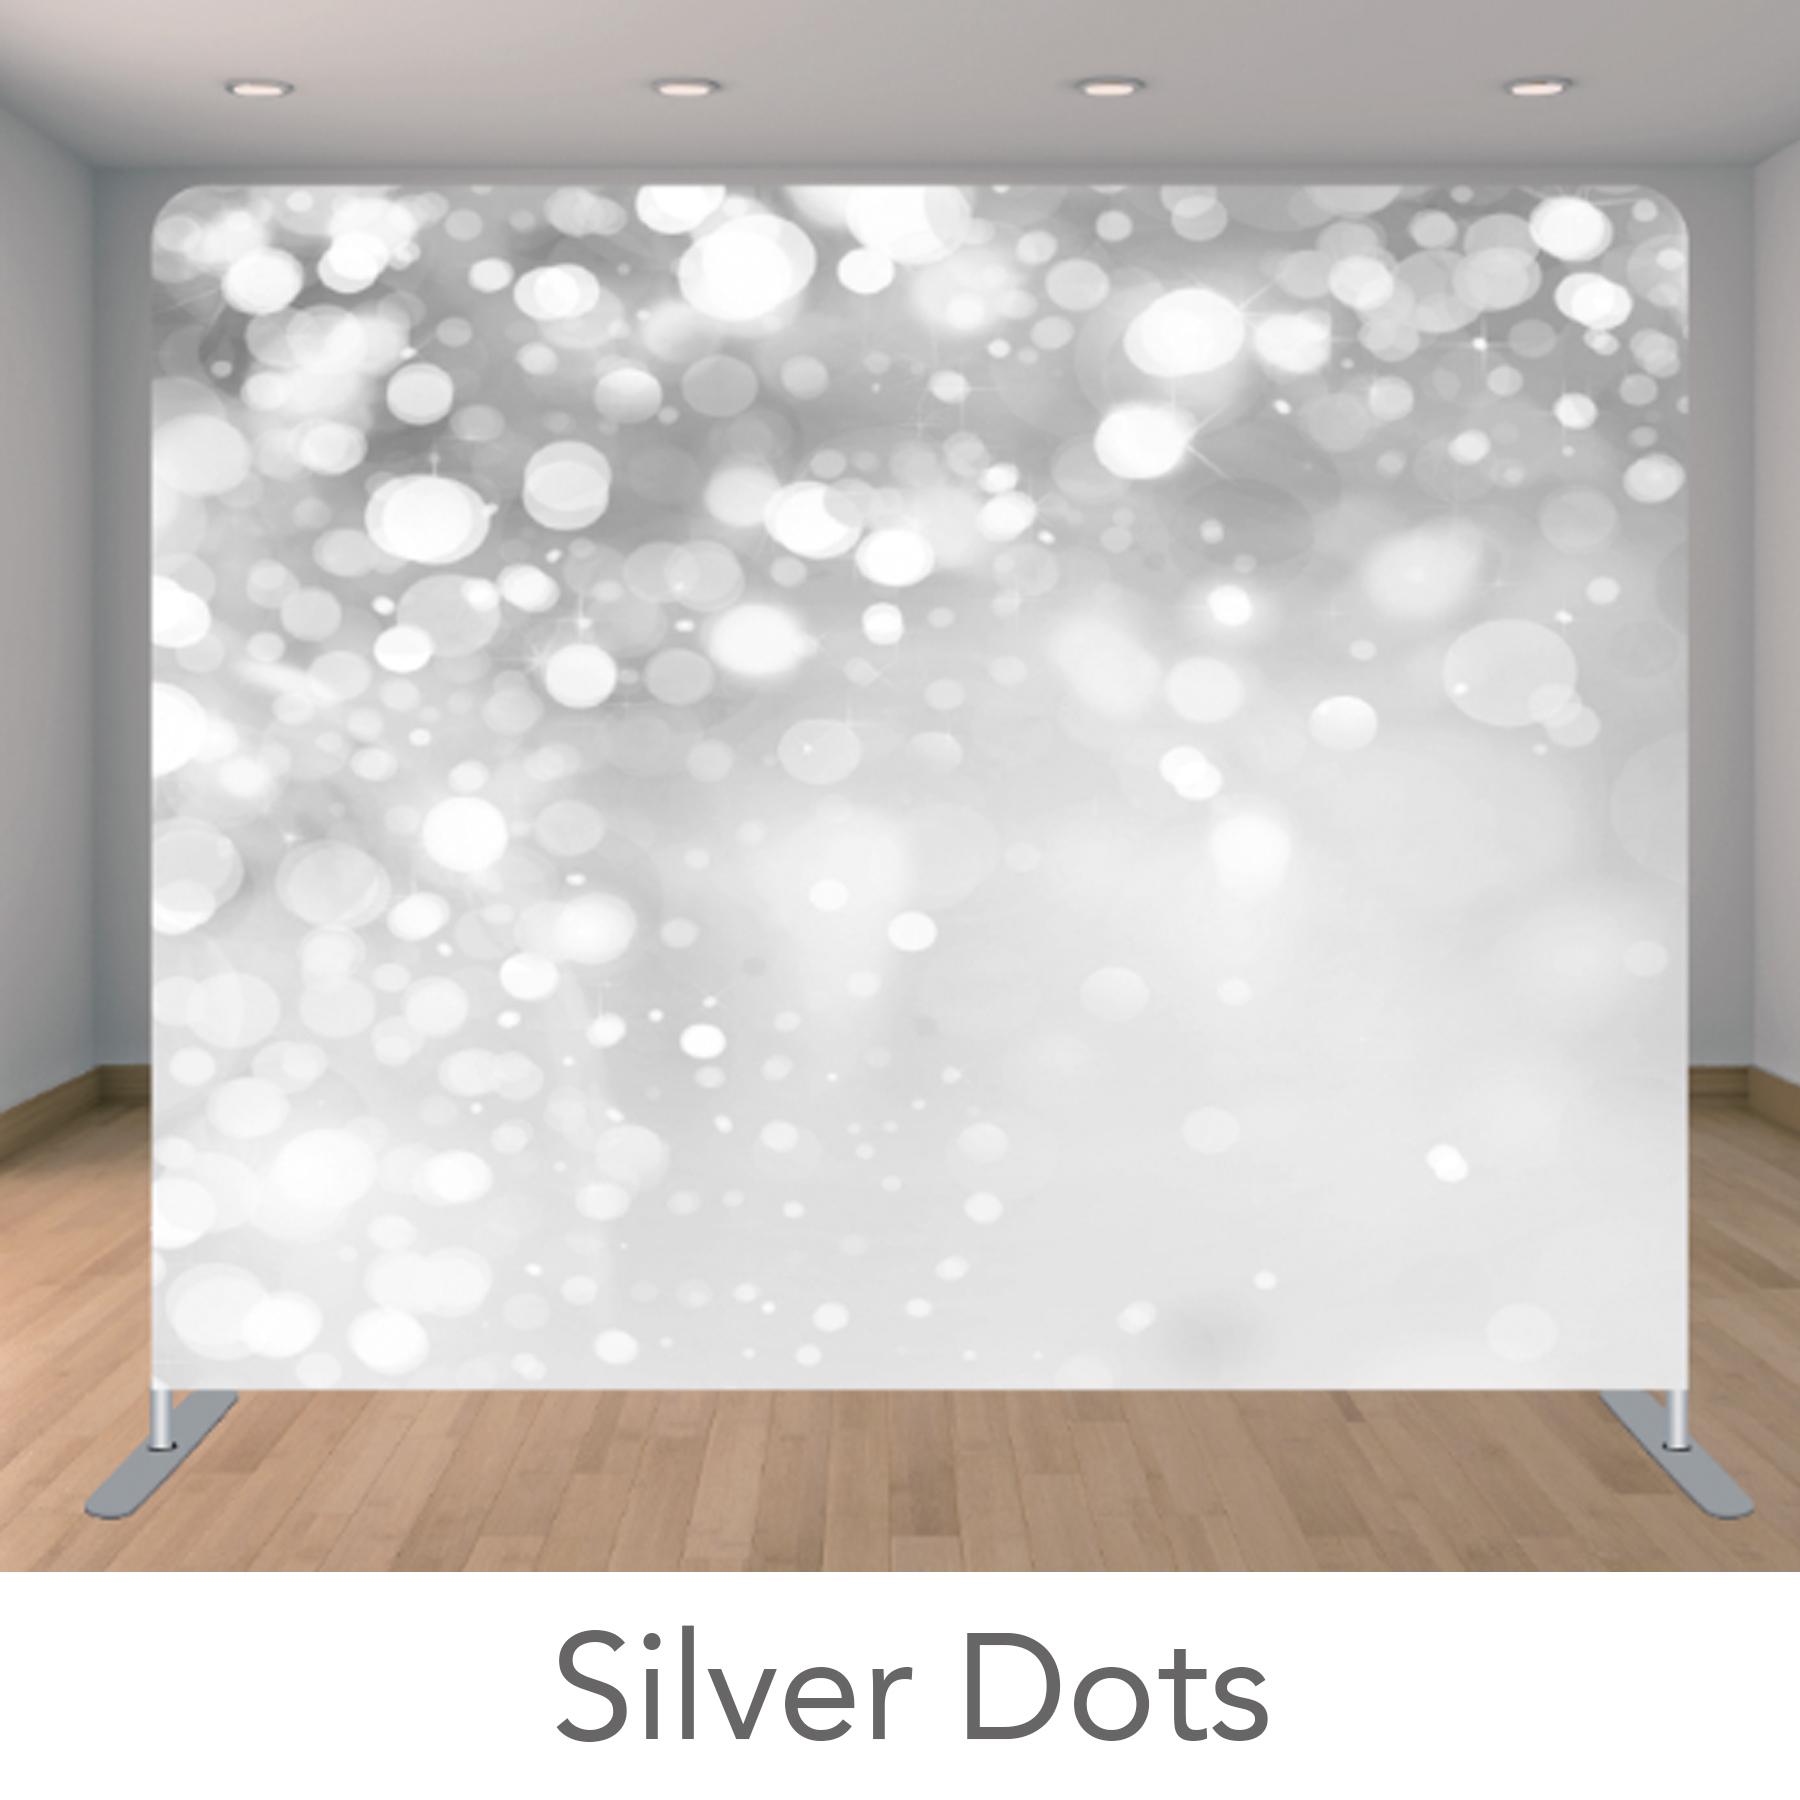 SilverDots.jpg